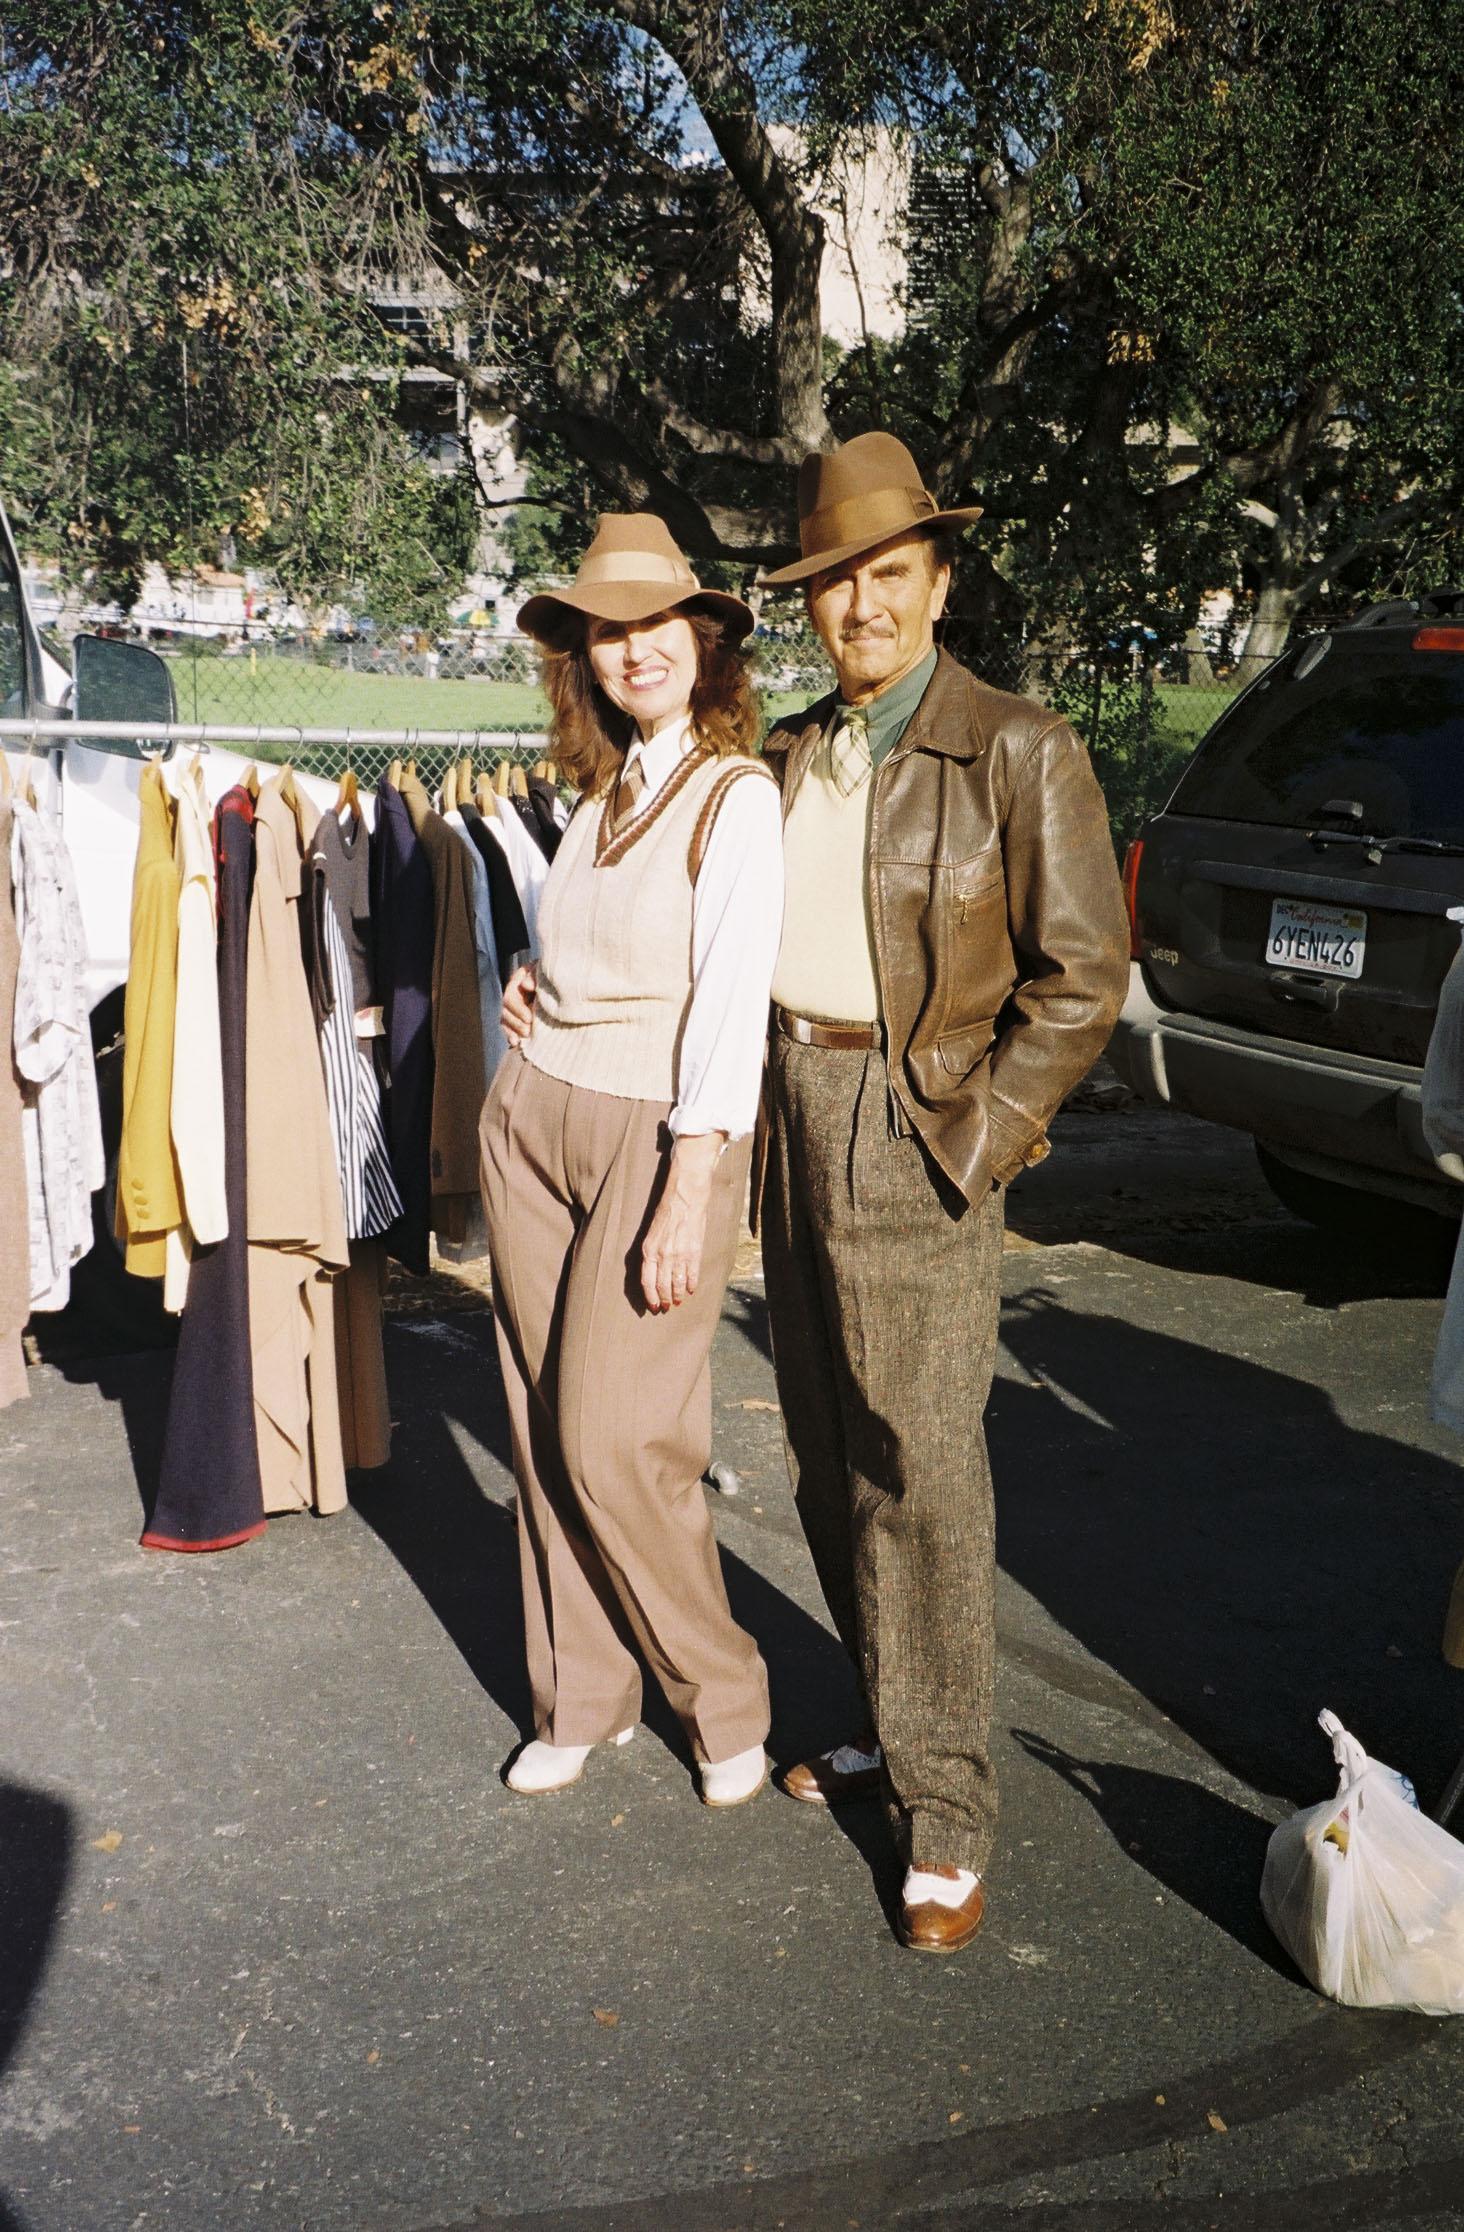 LA - Vintage style